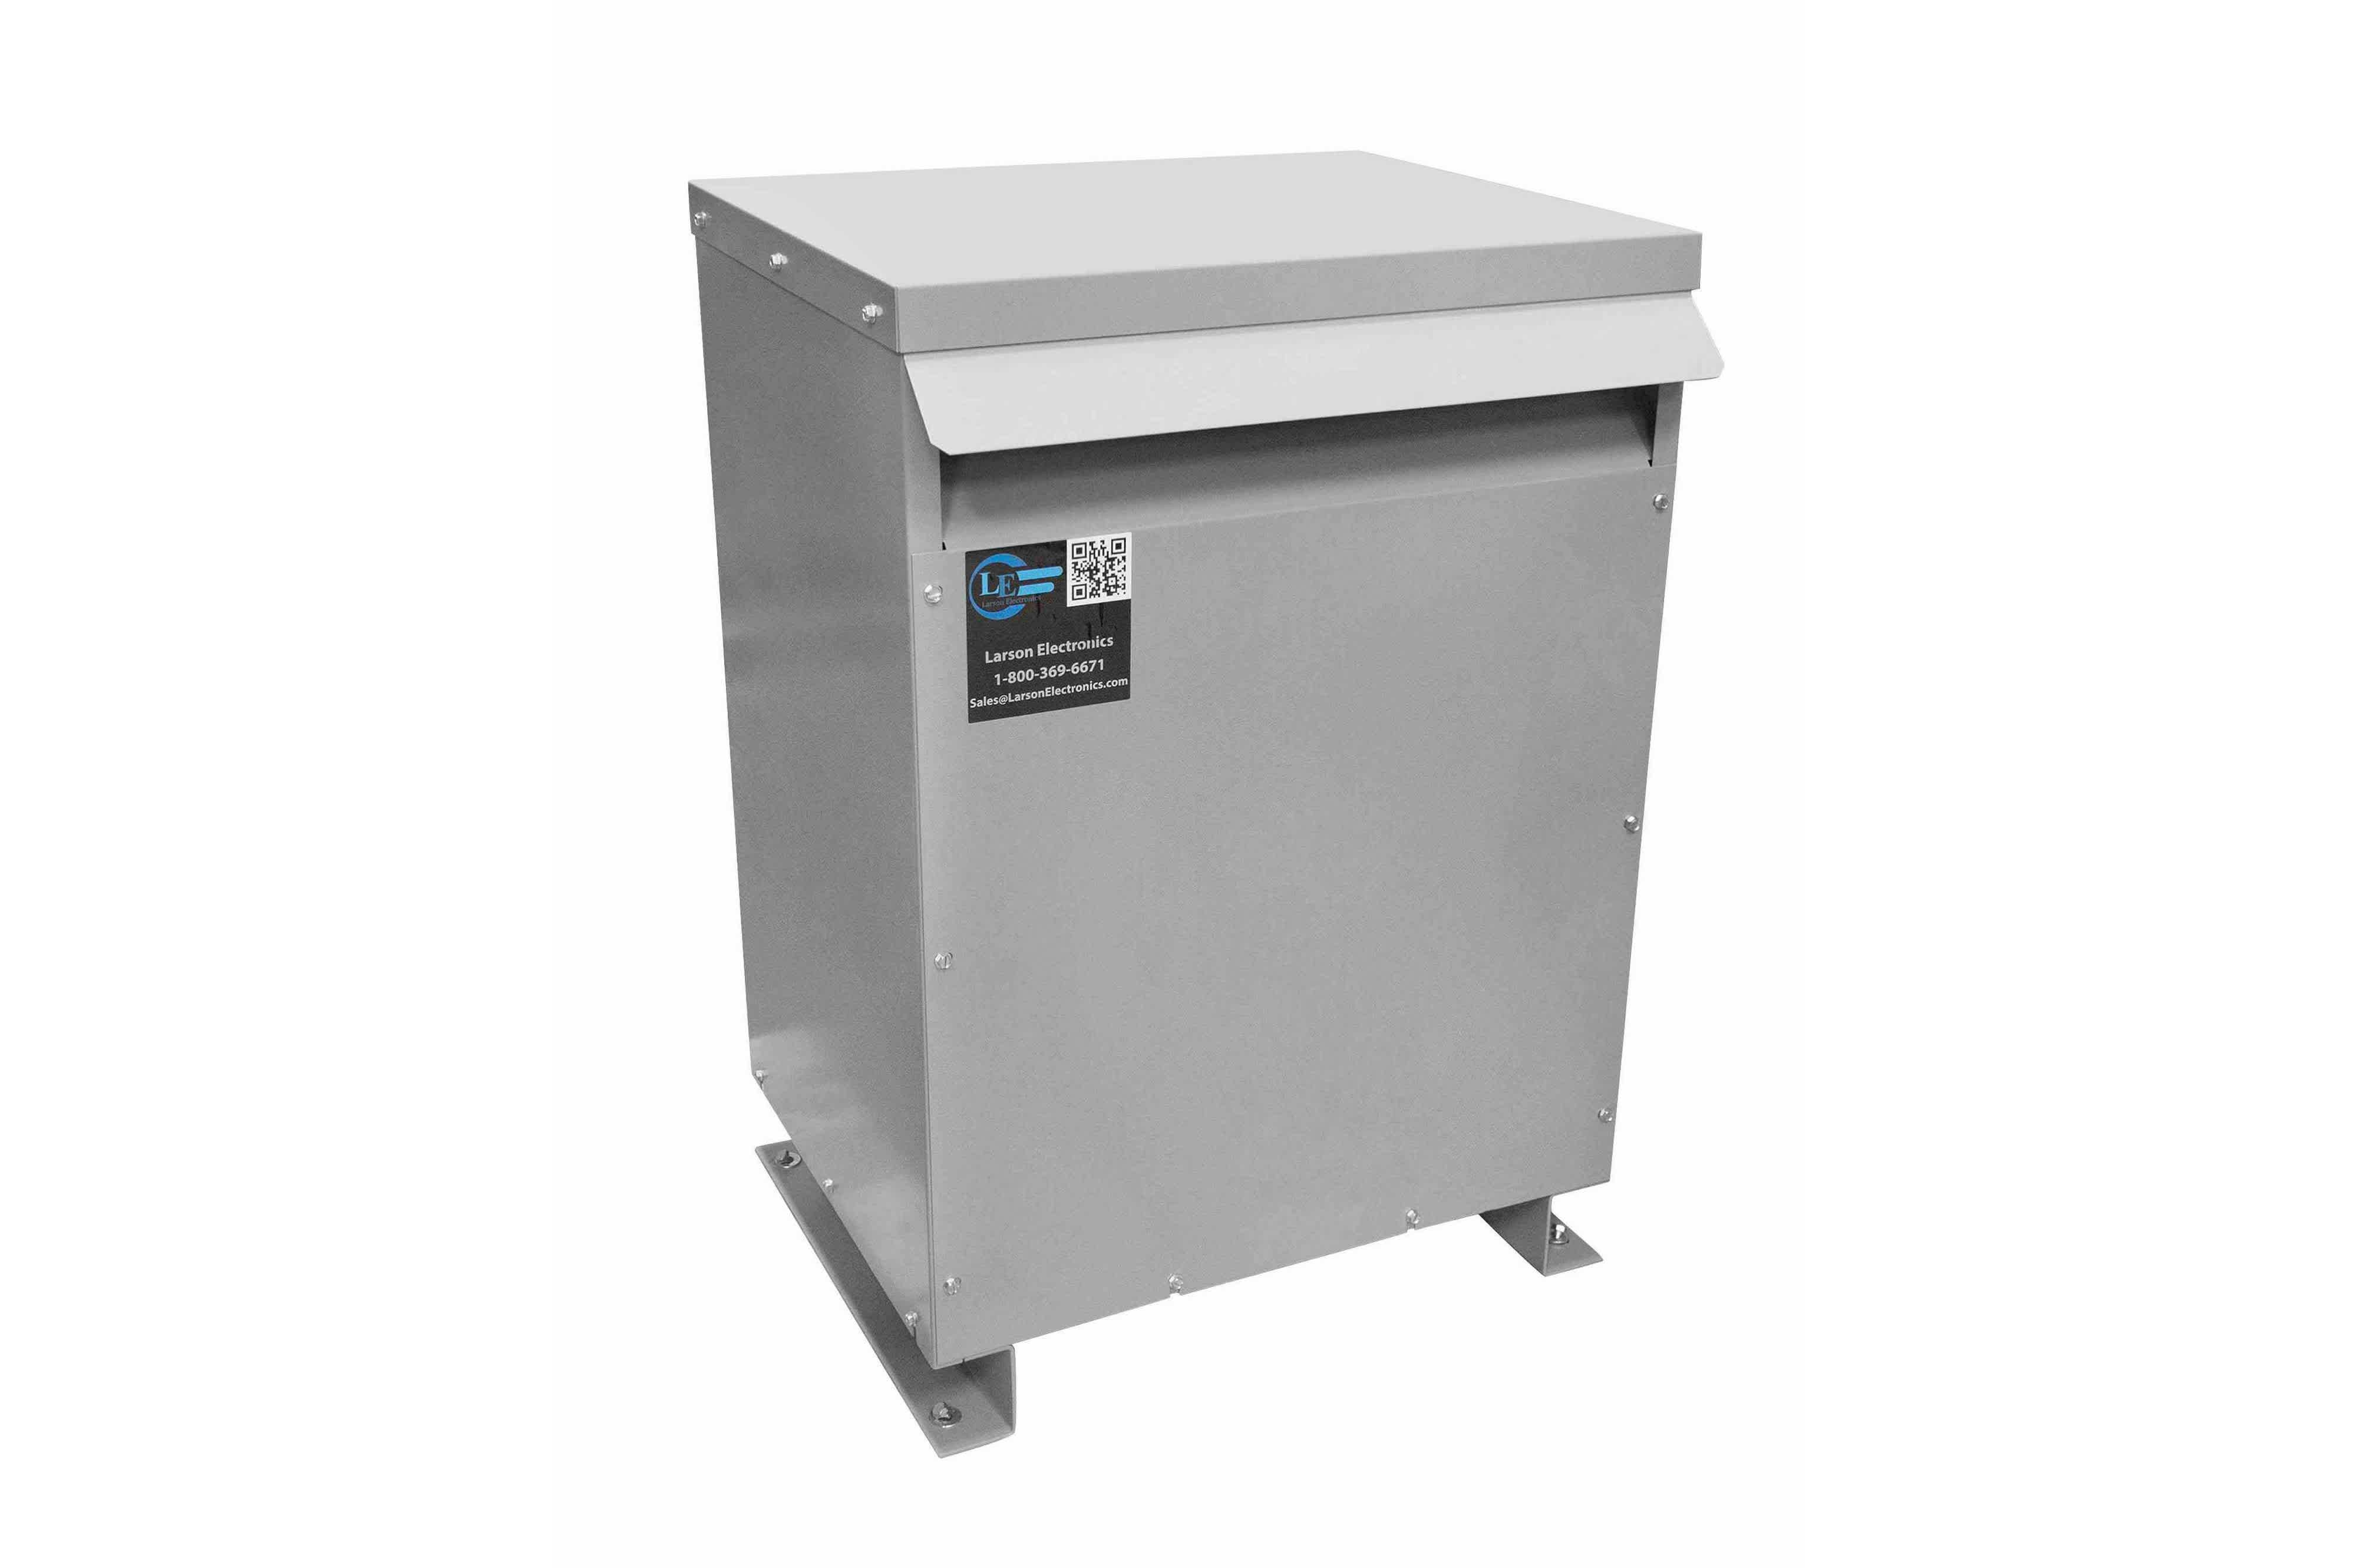 100 kVA 3PH Isolation Transformer, 460V Wye Primary, 575Y/332 Wye-N Secondary, N3R, Ventilated, 60 Hz